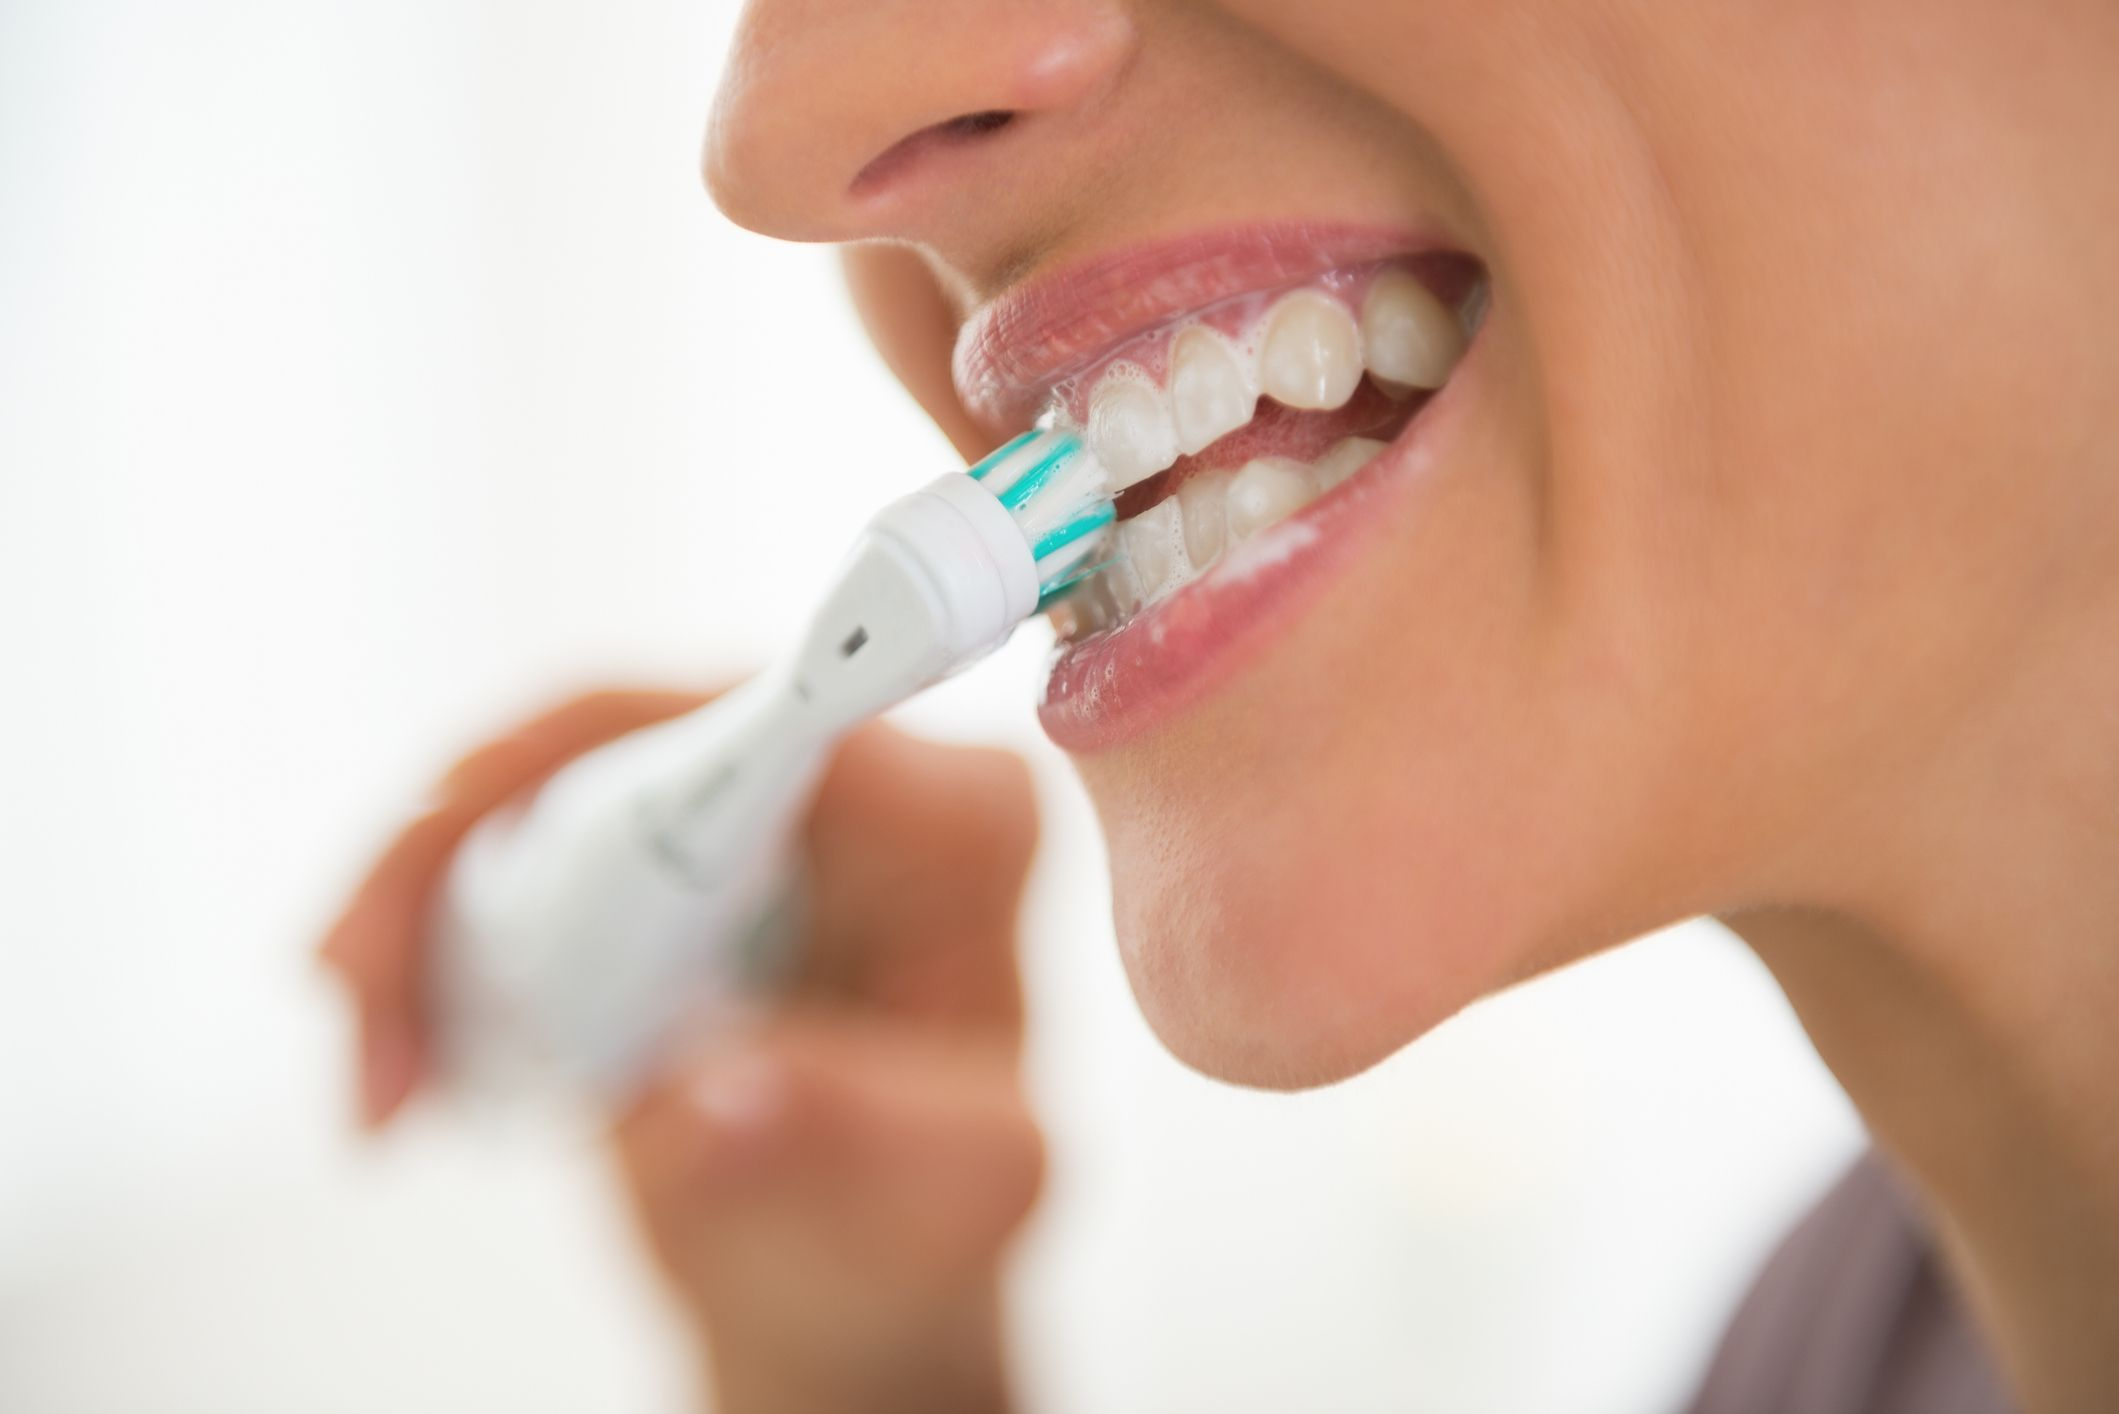 AquaSonic Toothbrushes